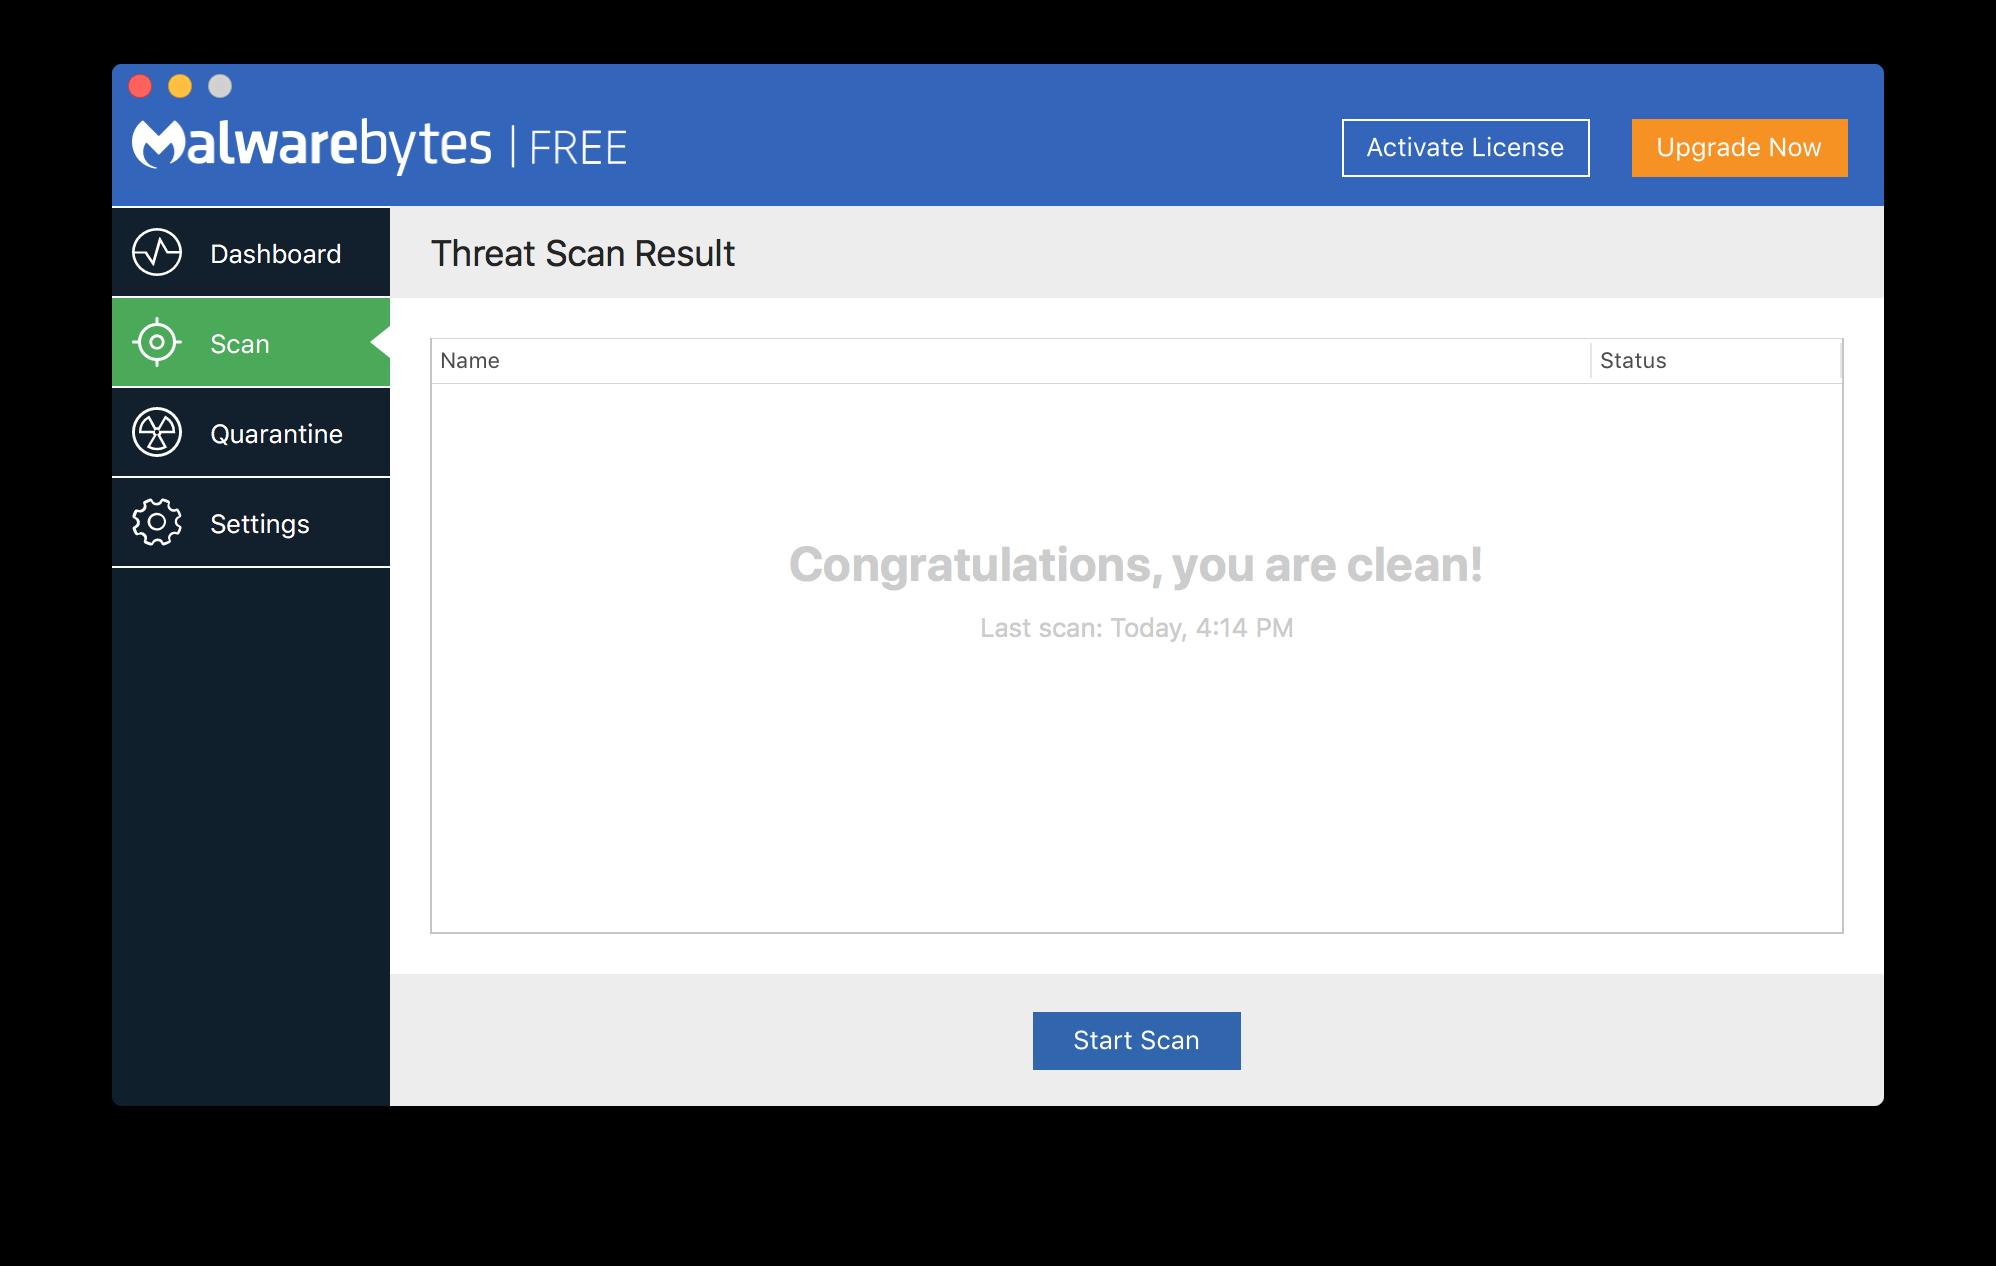 malwarebytes full version free 2018